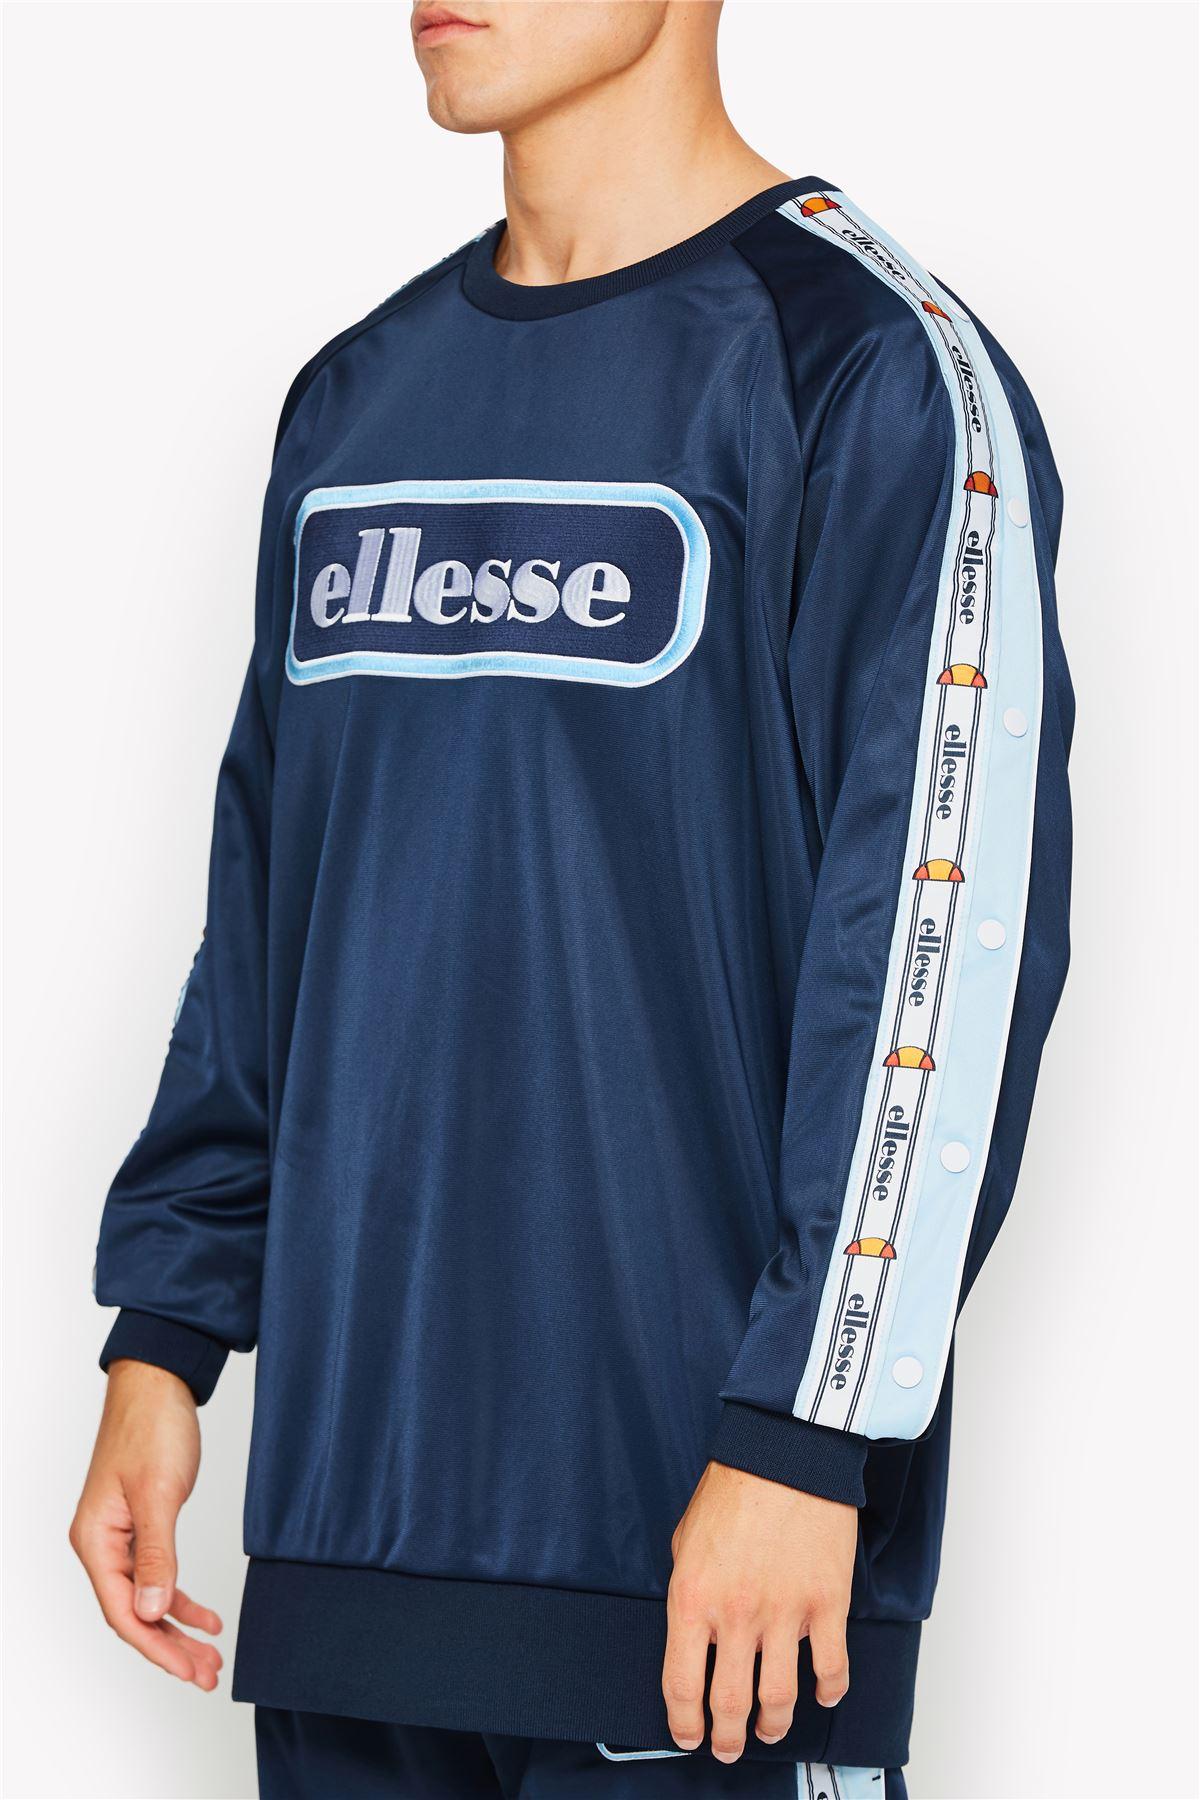 Ellesse-Trainingsanzug-Crew-Hals-Retro-Pullover-Top-amp-Trainingshose-Einzel-Dinge Indexbild 8